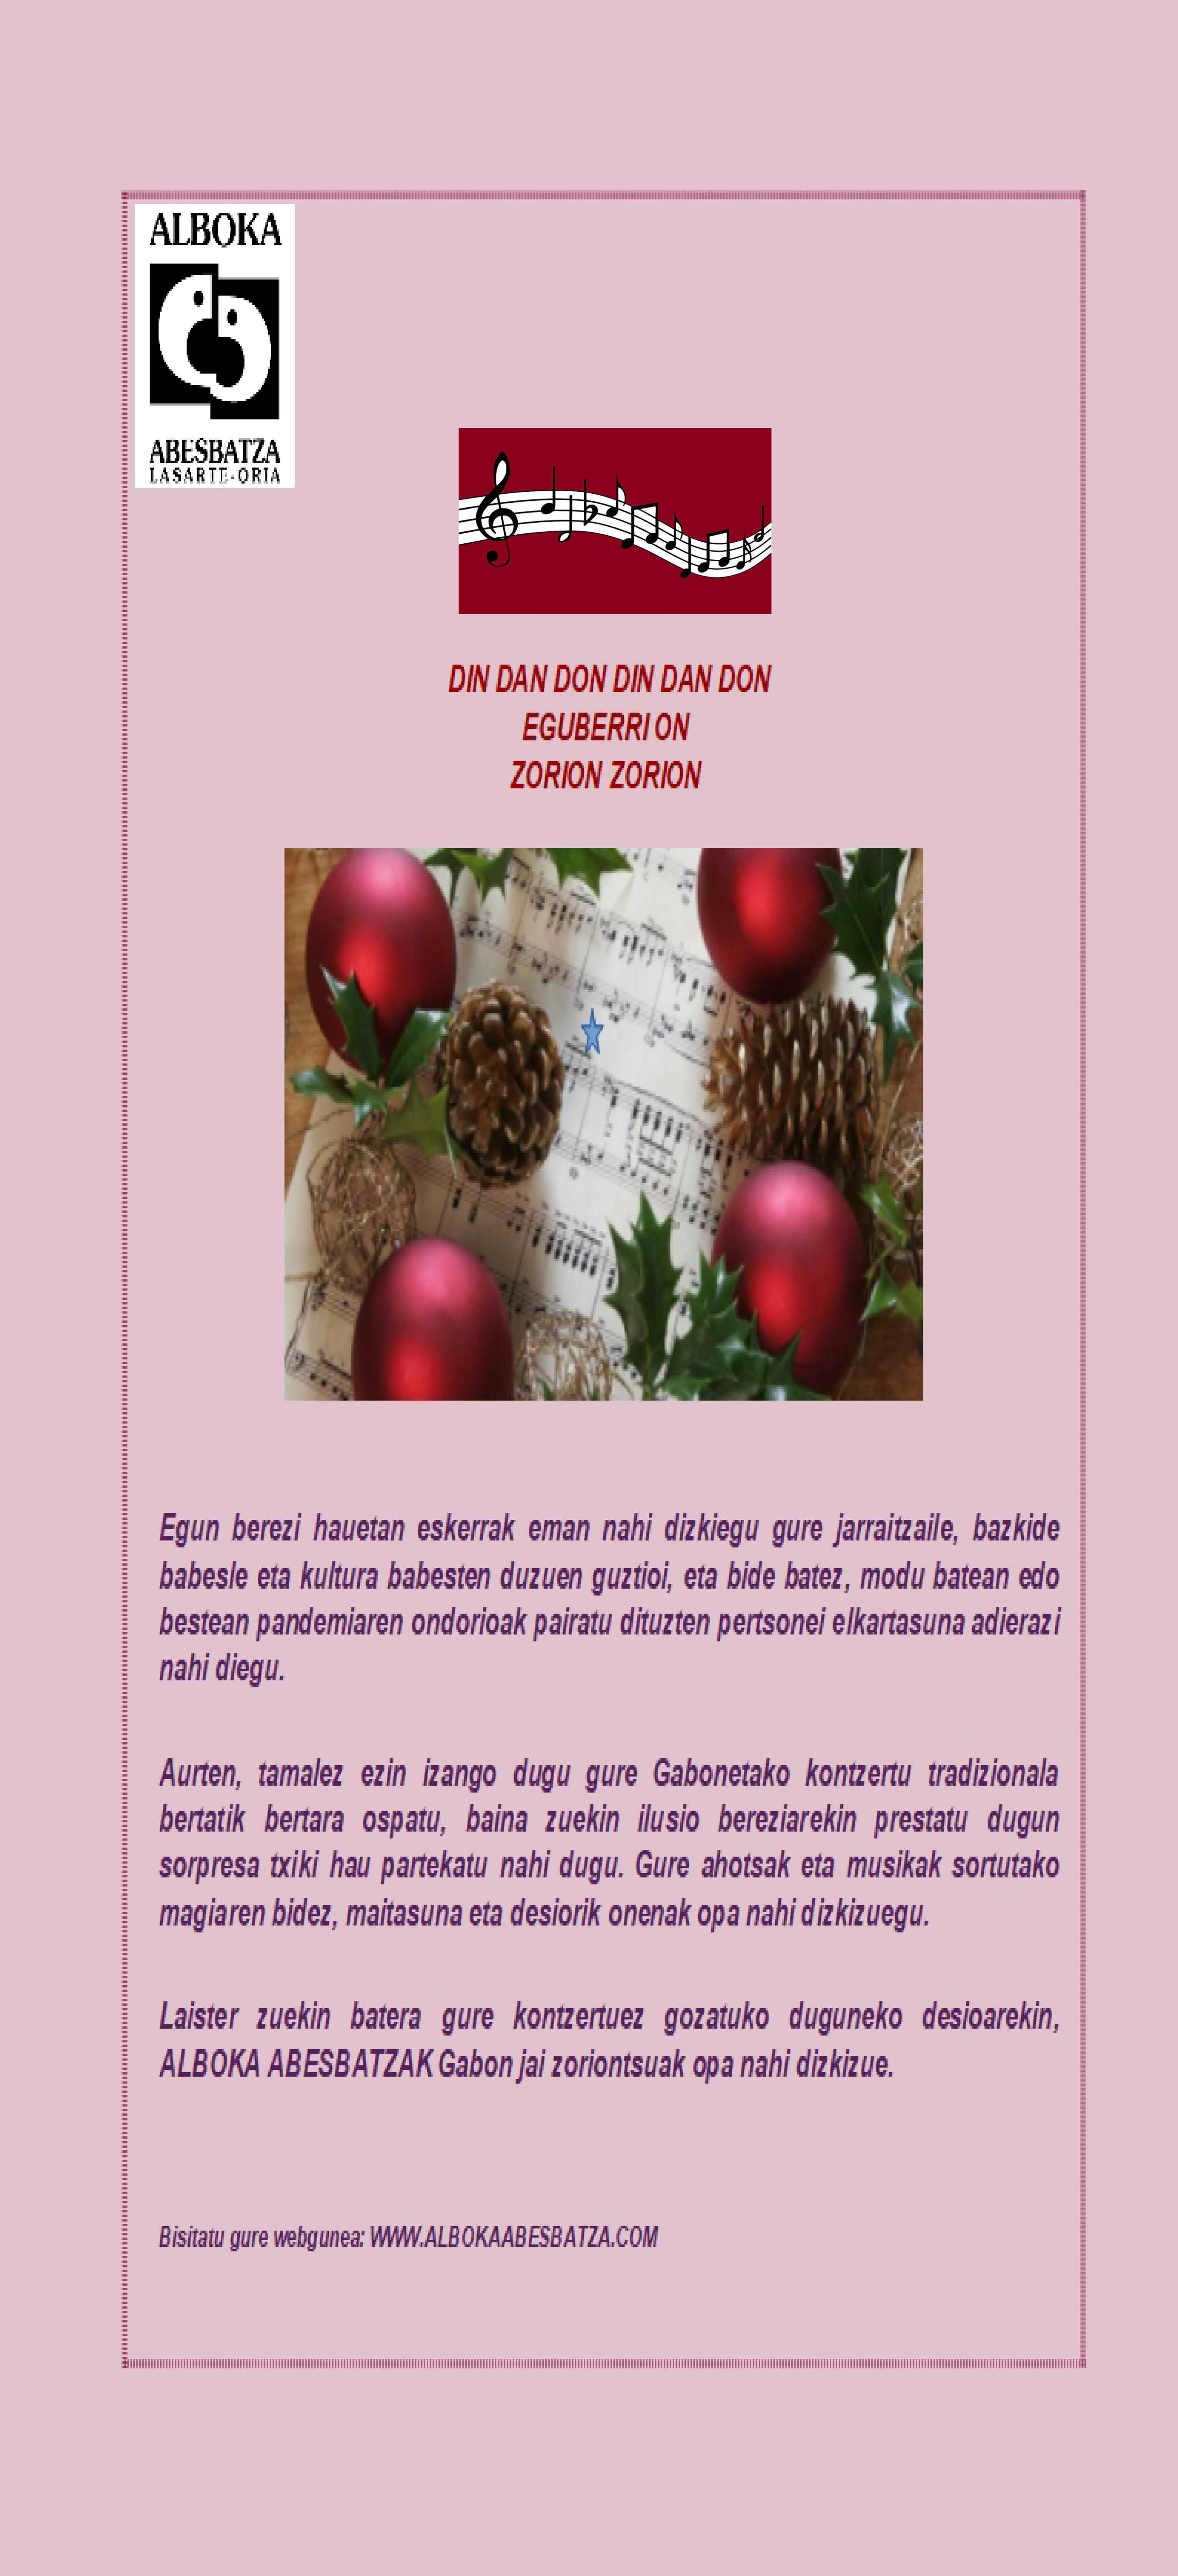 Alboka Navidad 2020 euskera